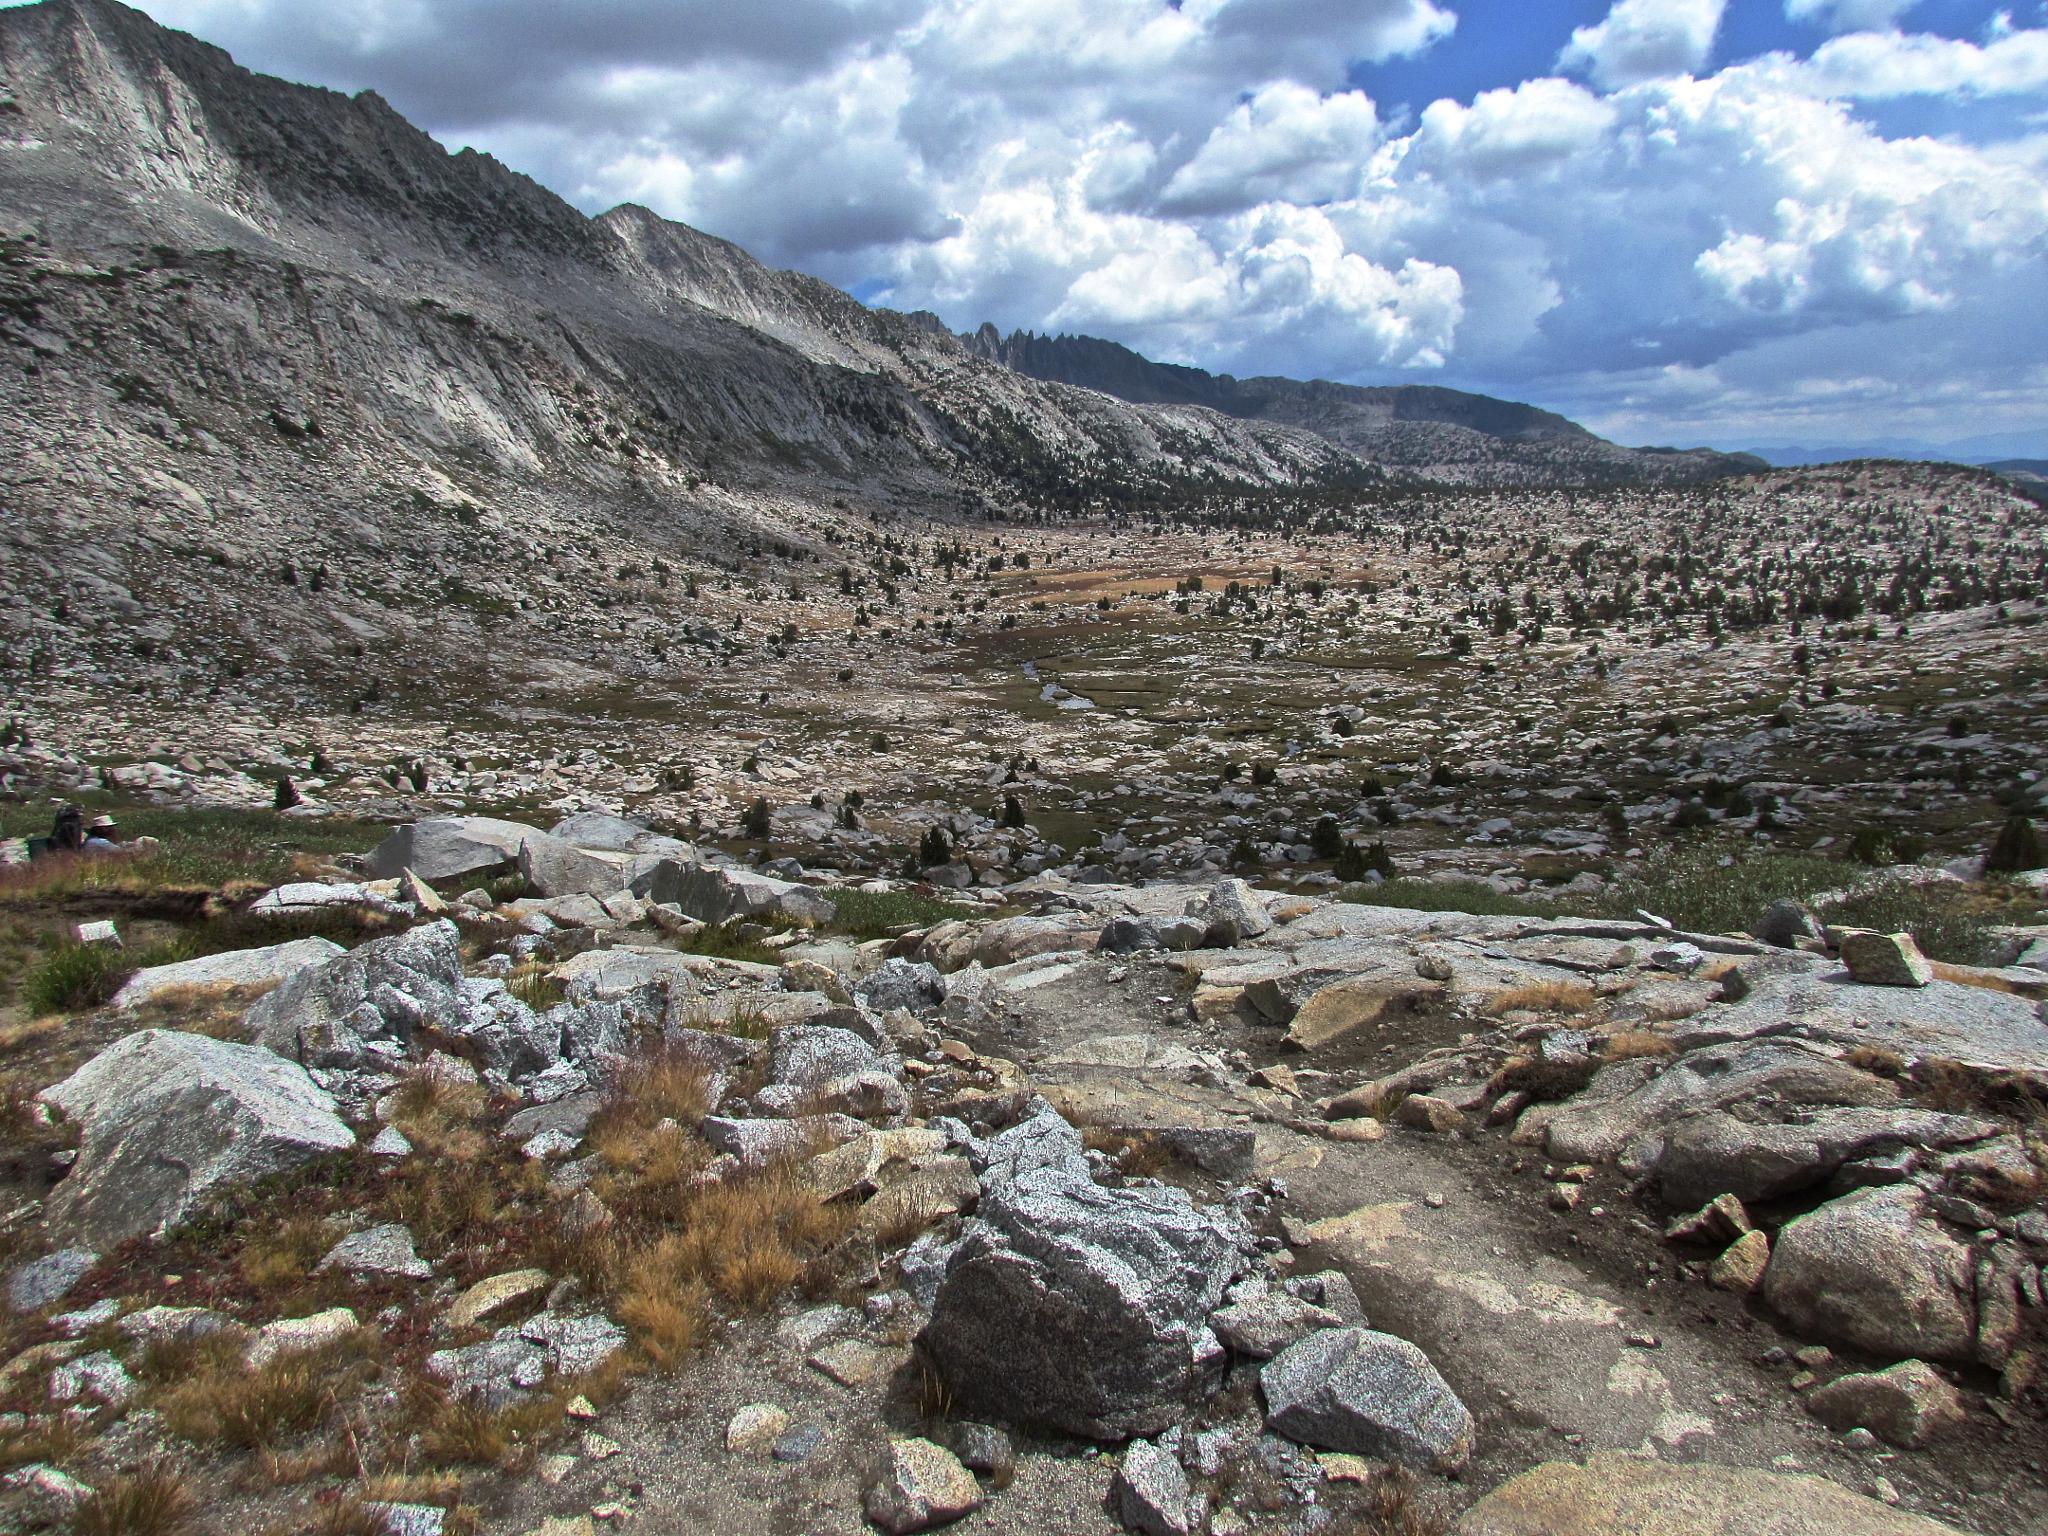 Tha Ansel Adams Wilderness (2 of 3) by MelanieAnnePhillips